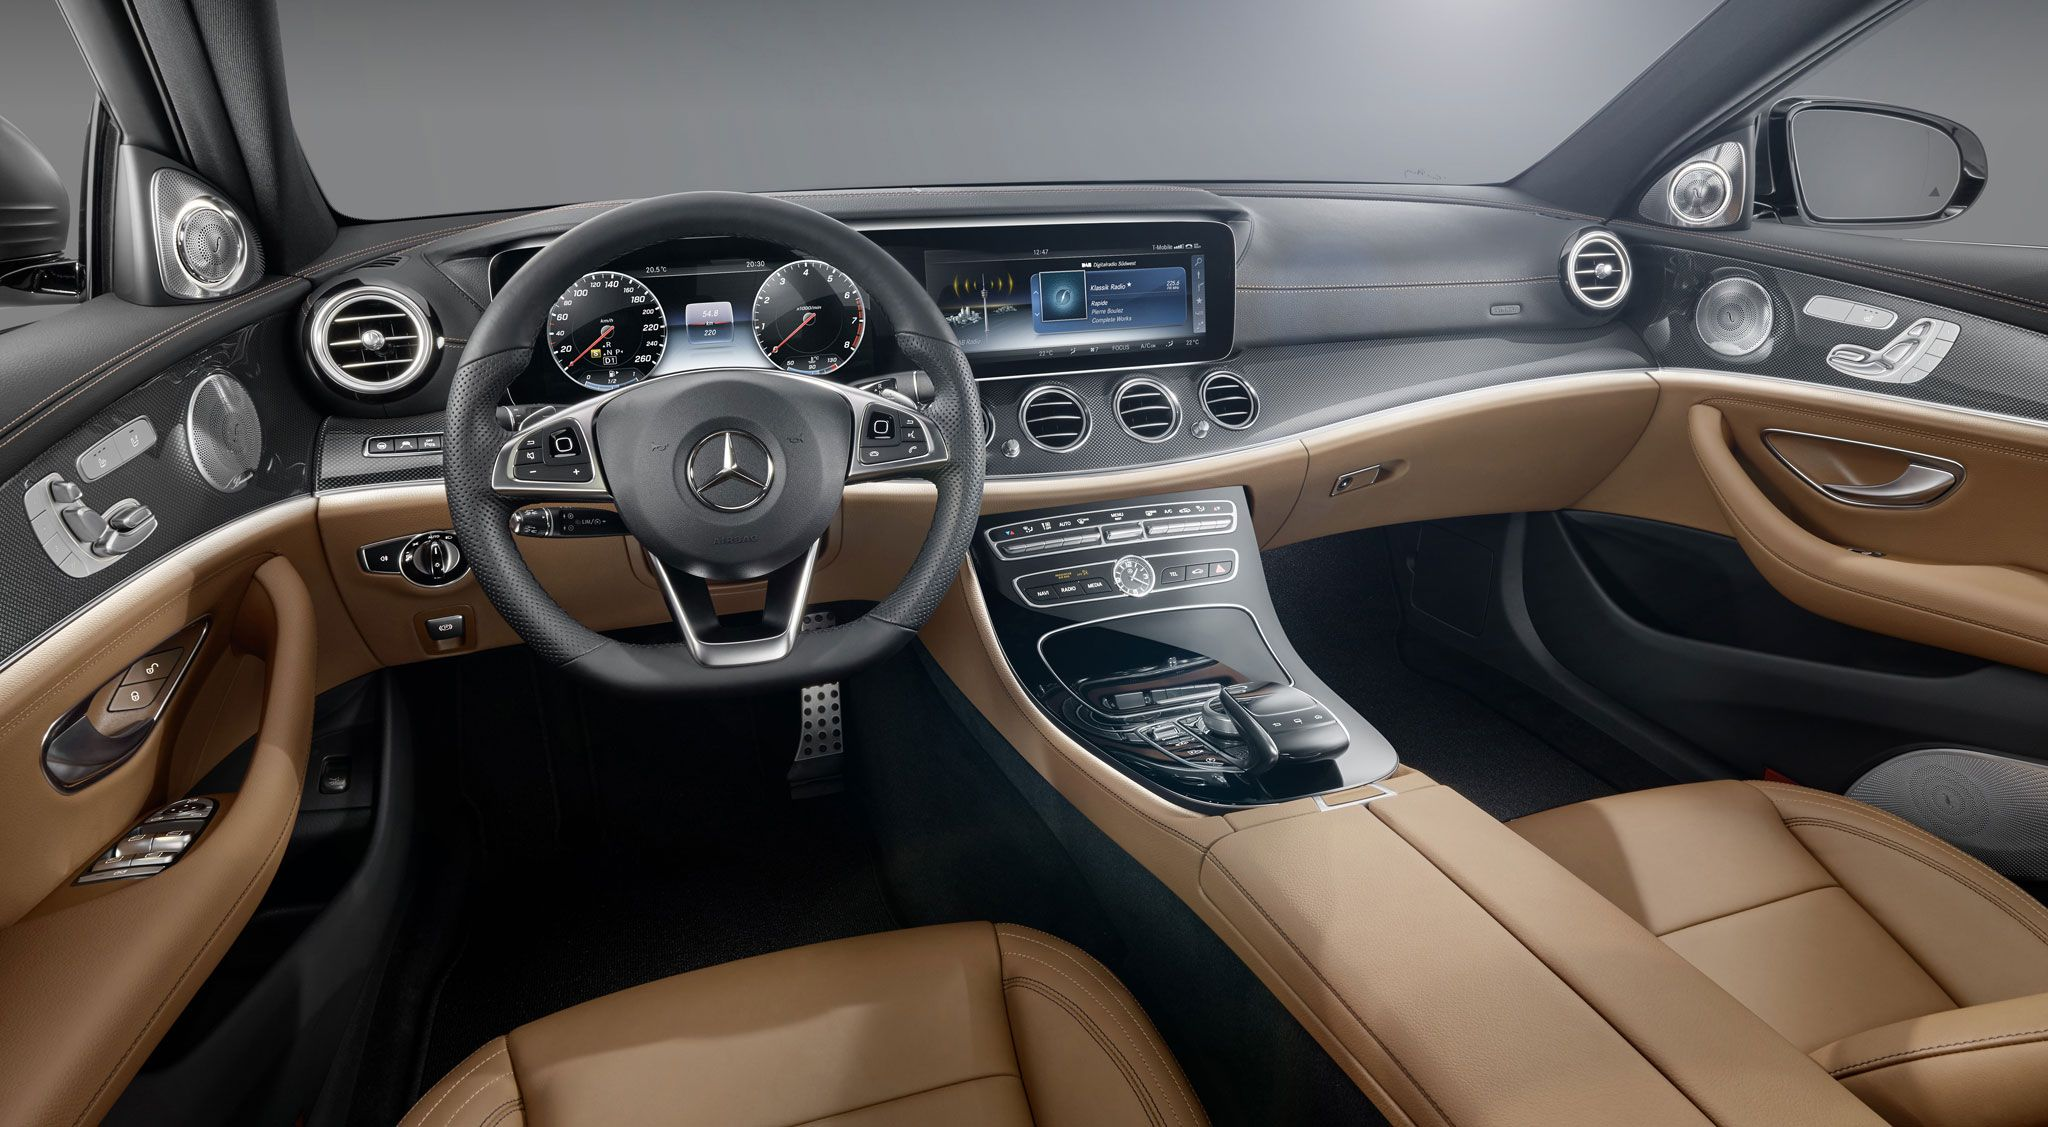 A Bord De La Nouvelle Mercedes Classe E Mercedes Benz Mercedes